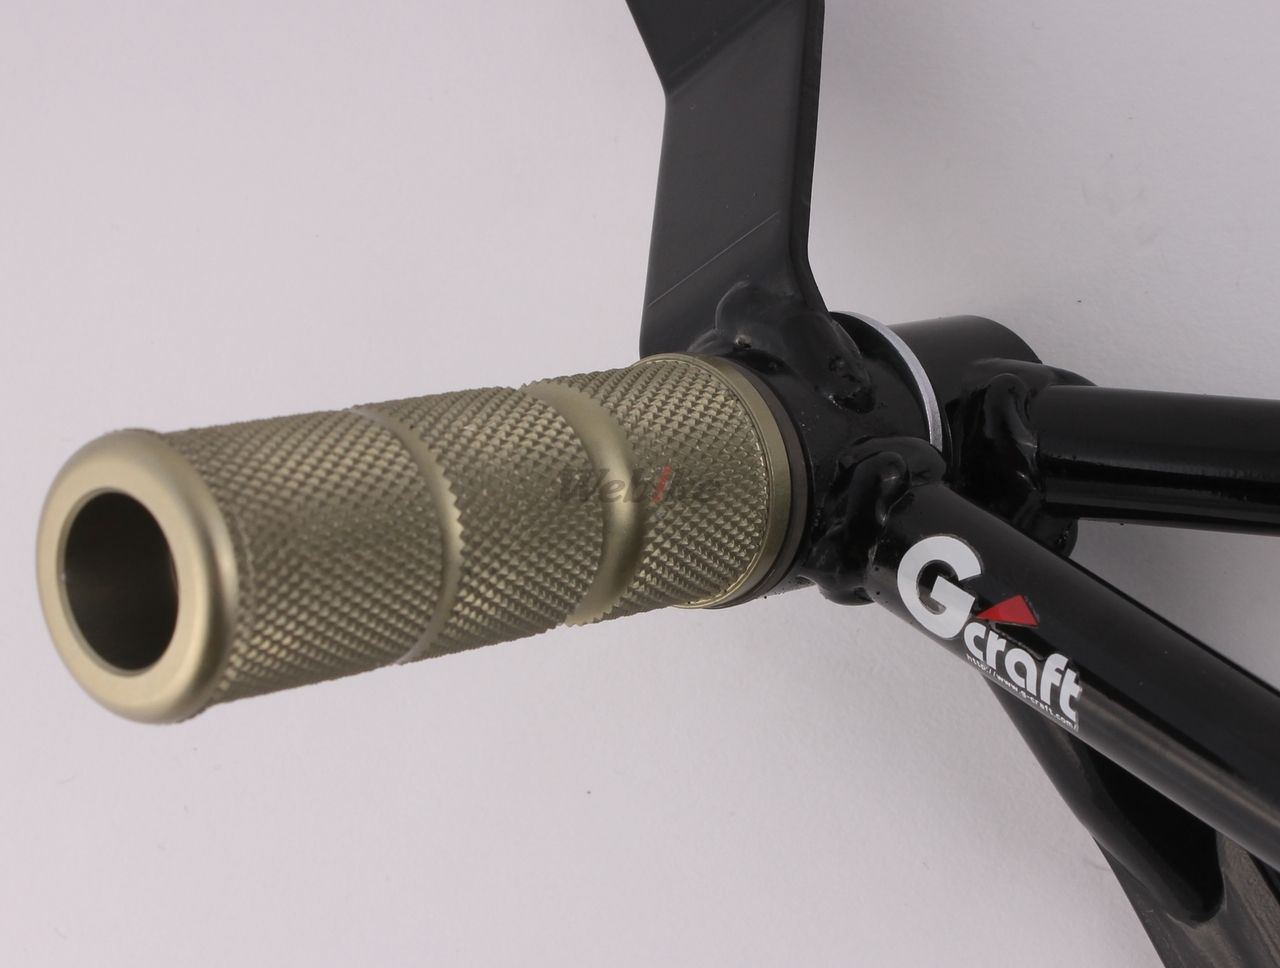 【G-Craft】Benly用 腳踏後移套件 - 「Webike-摩托百貨」